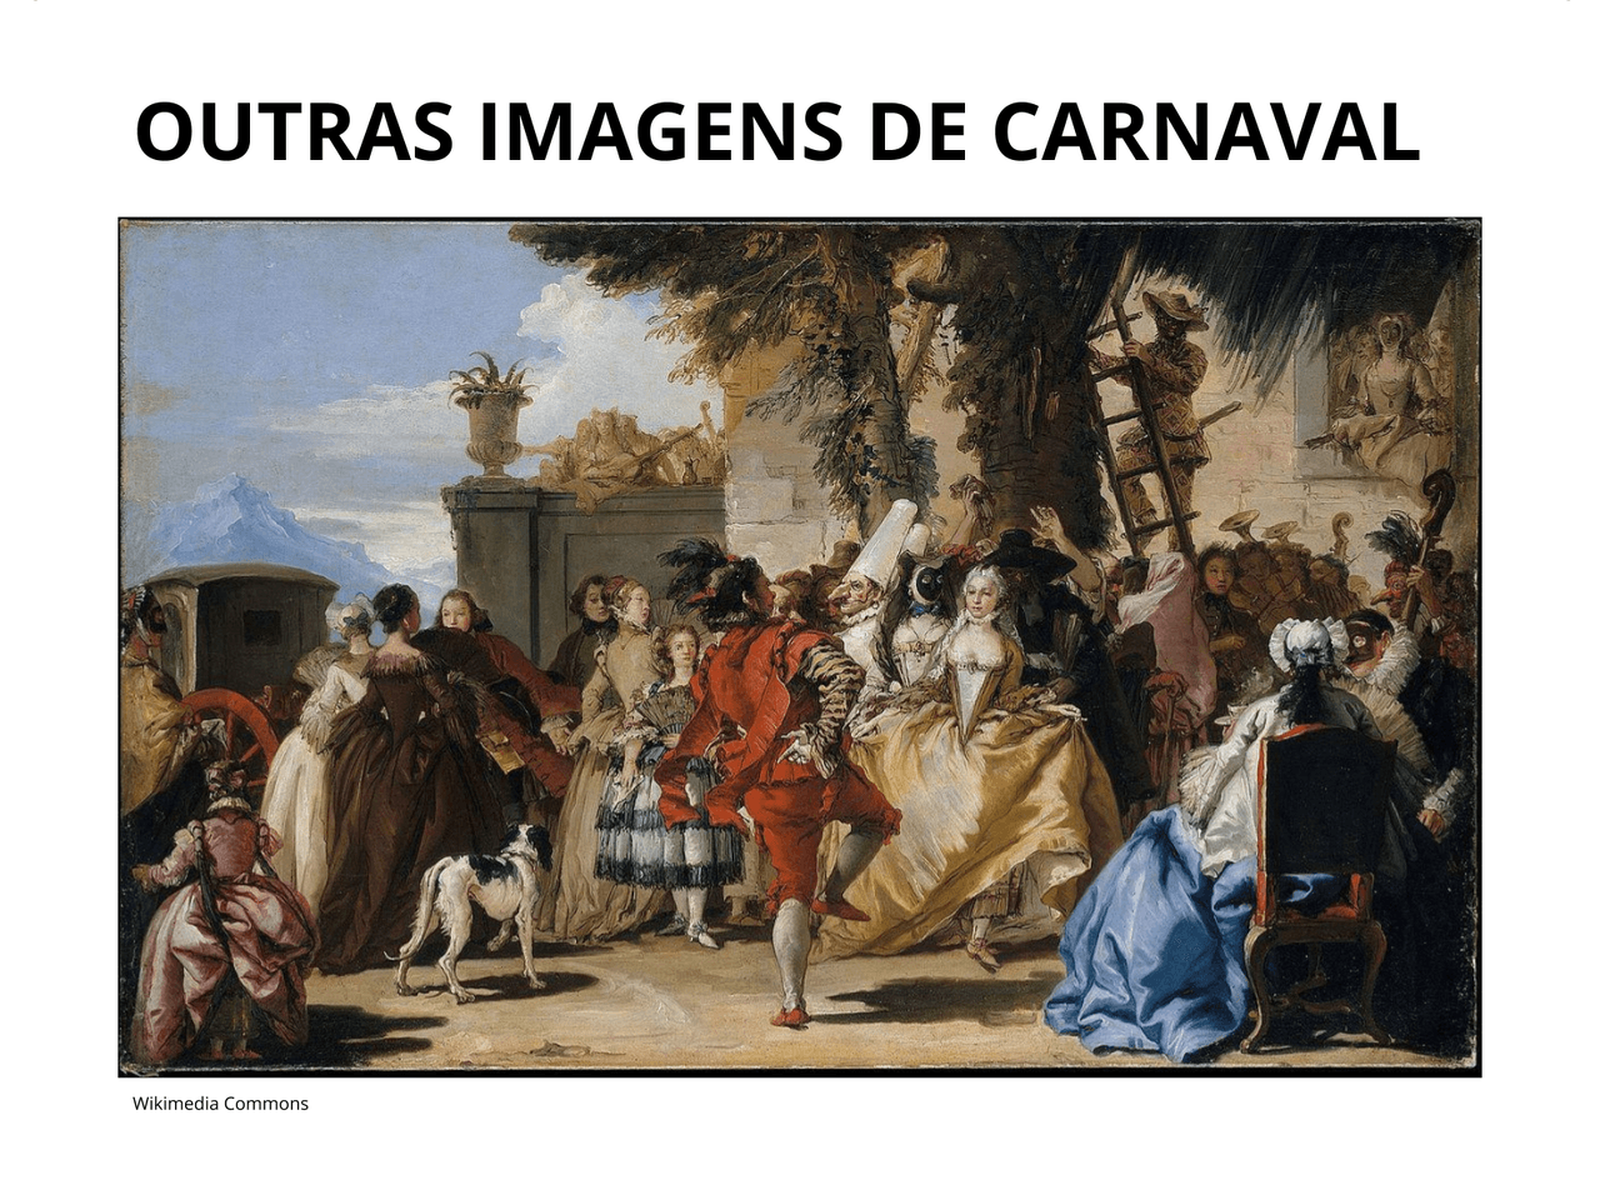 Origens do Carnaval